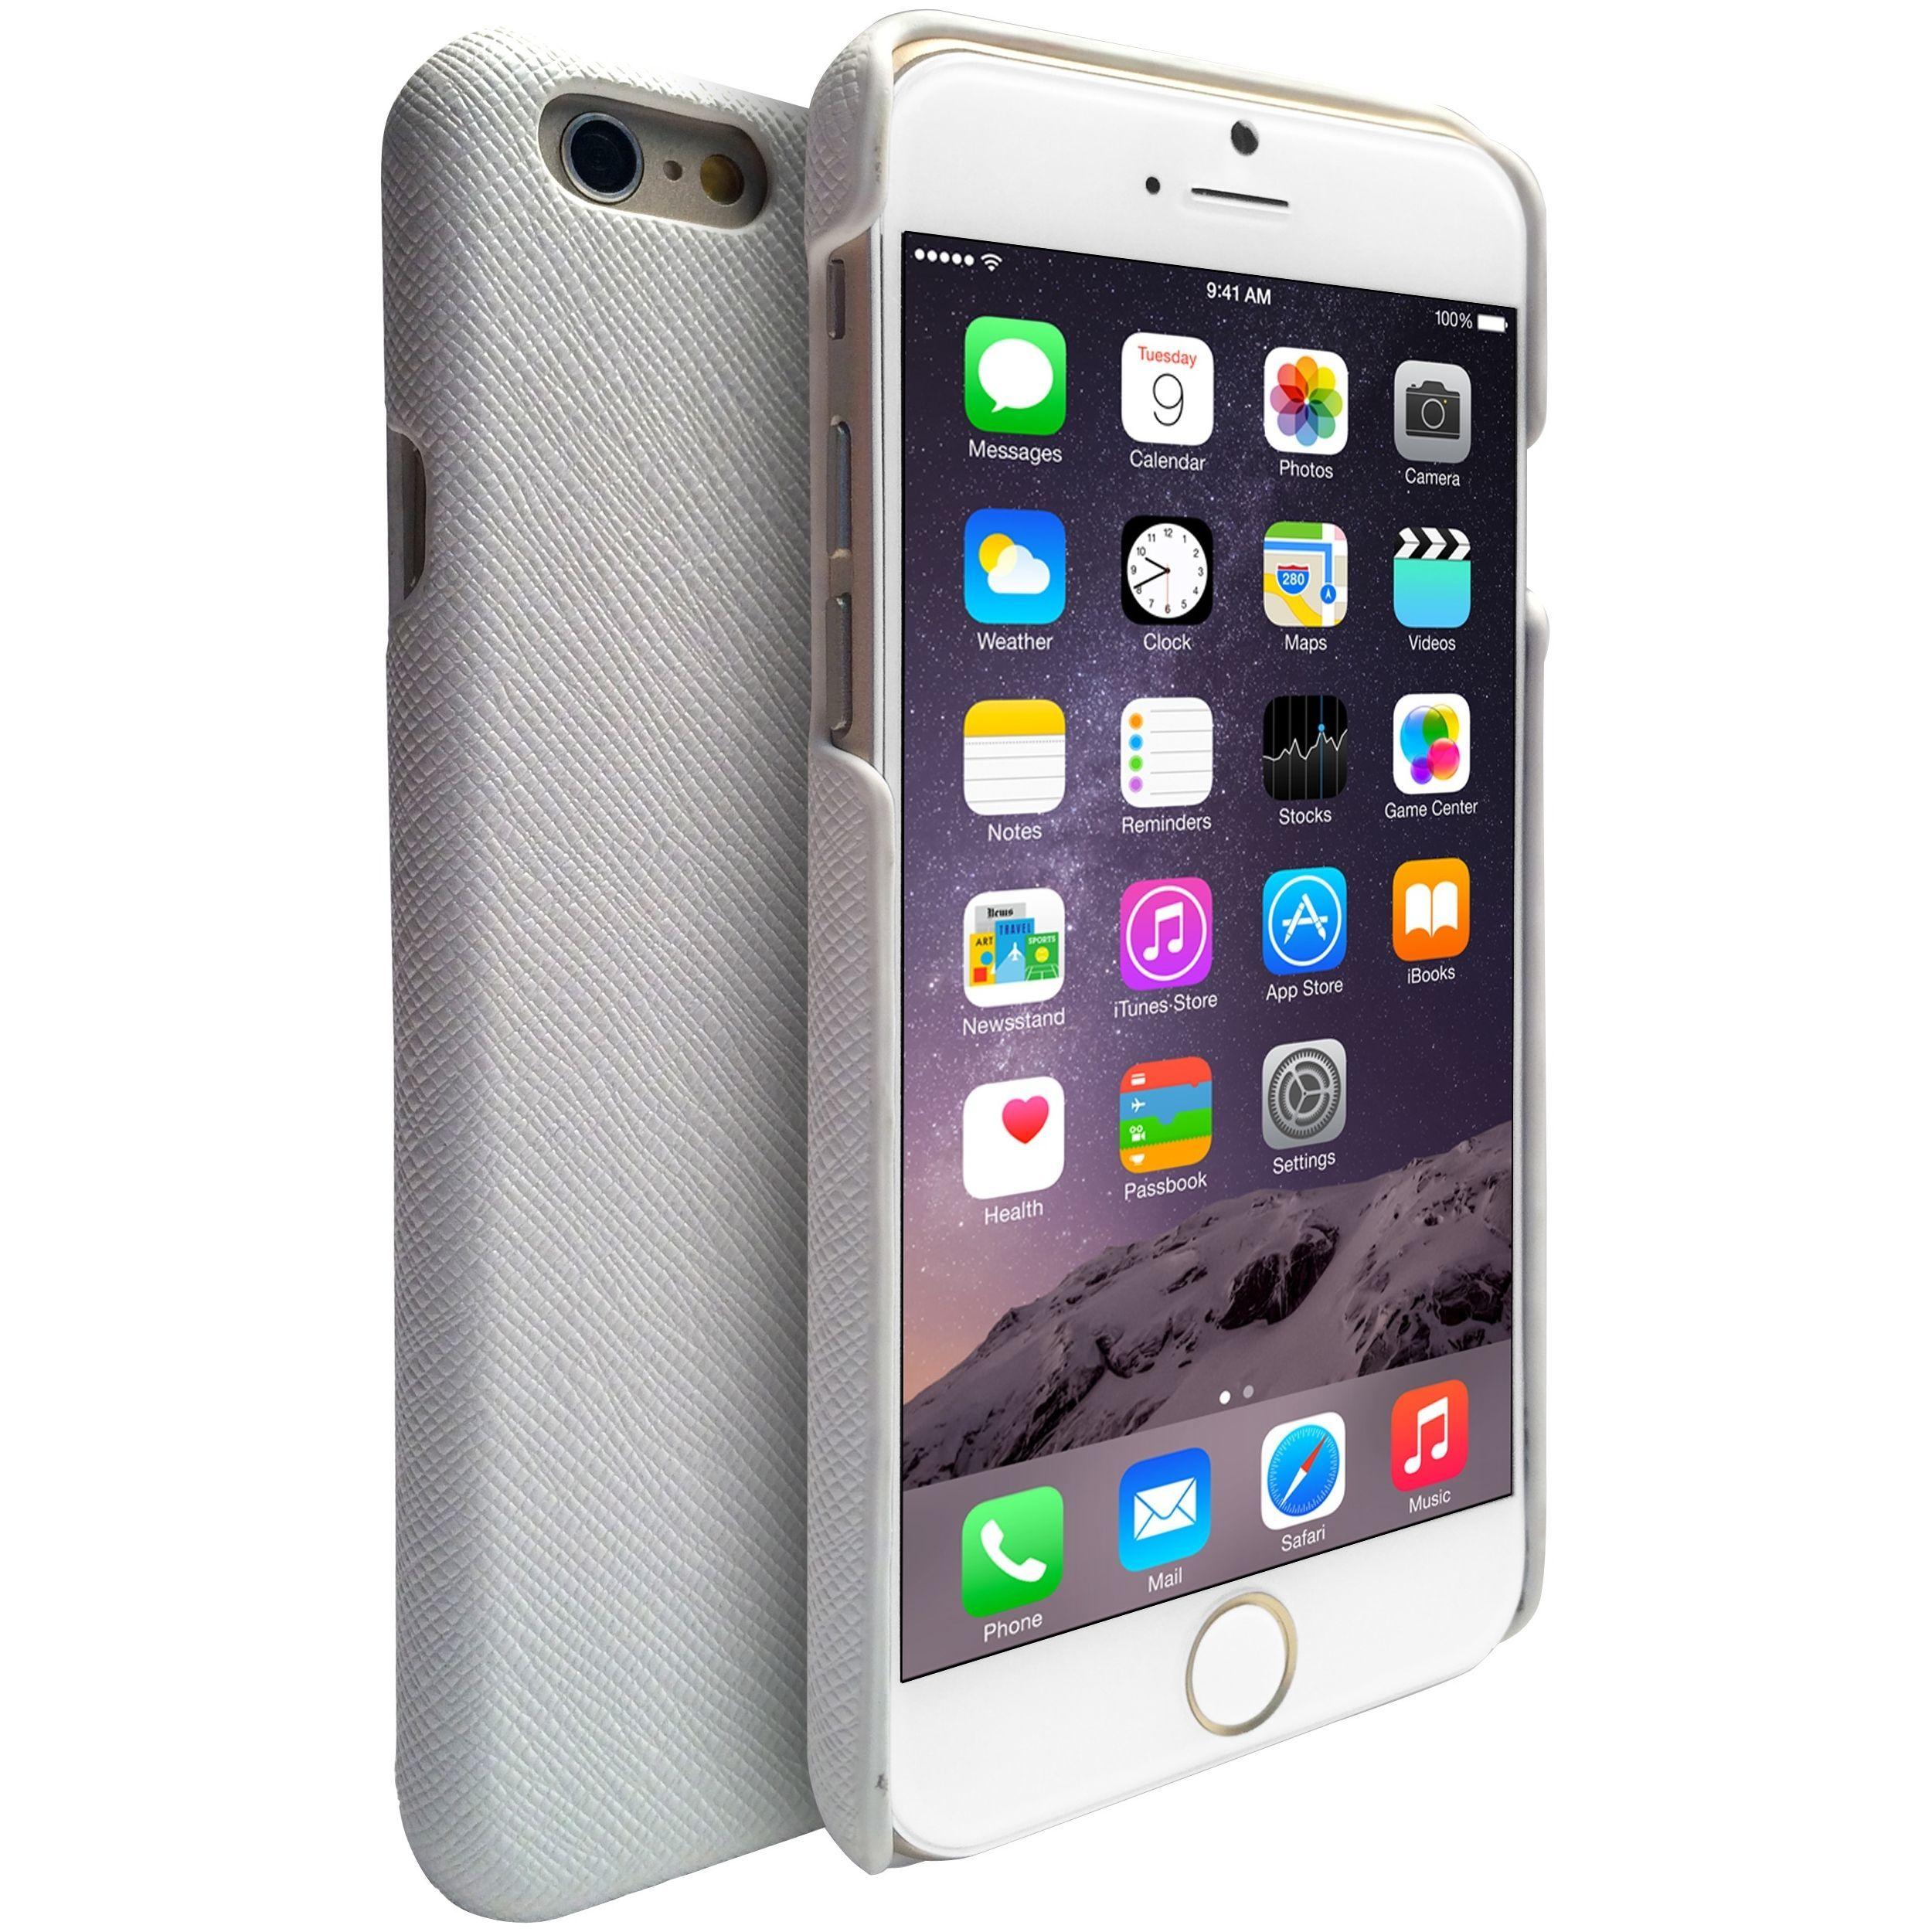 Patriot Memory SlimShell for iPhone 6 Plus, #PCSLSIP6L-WT